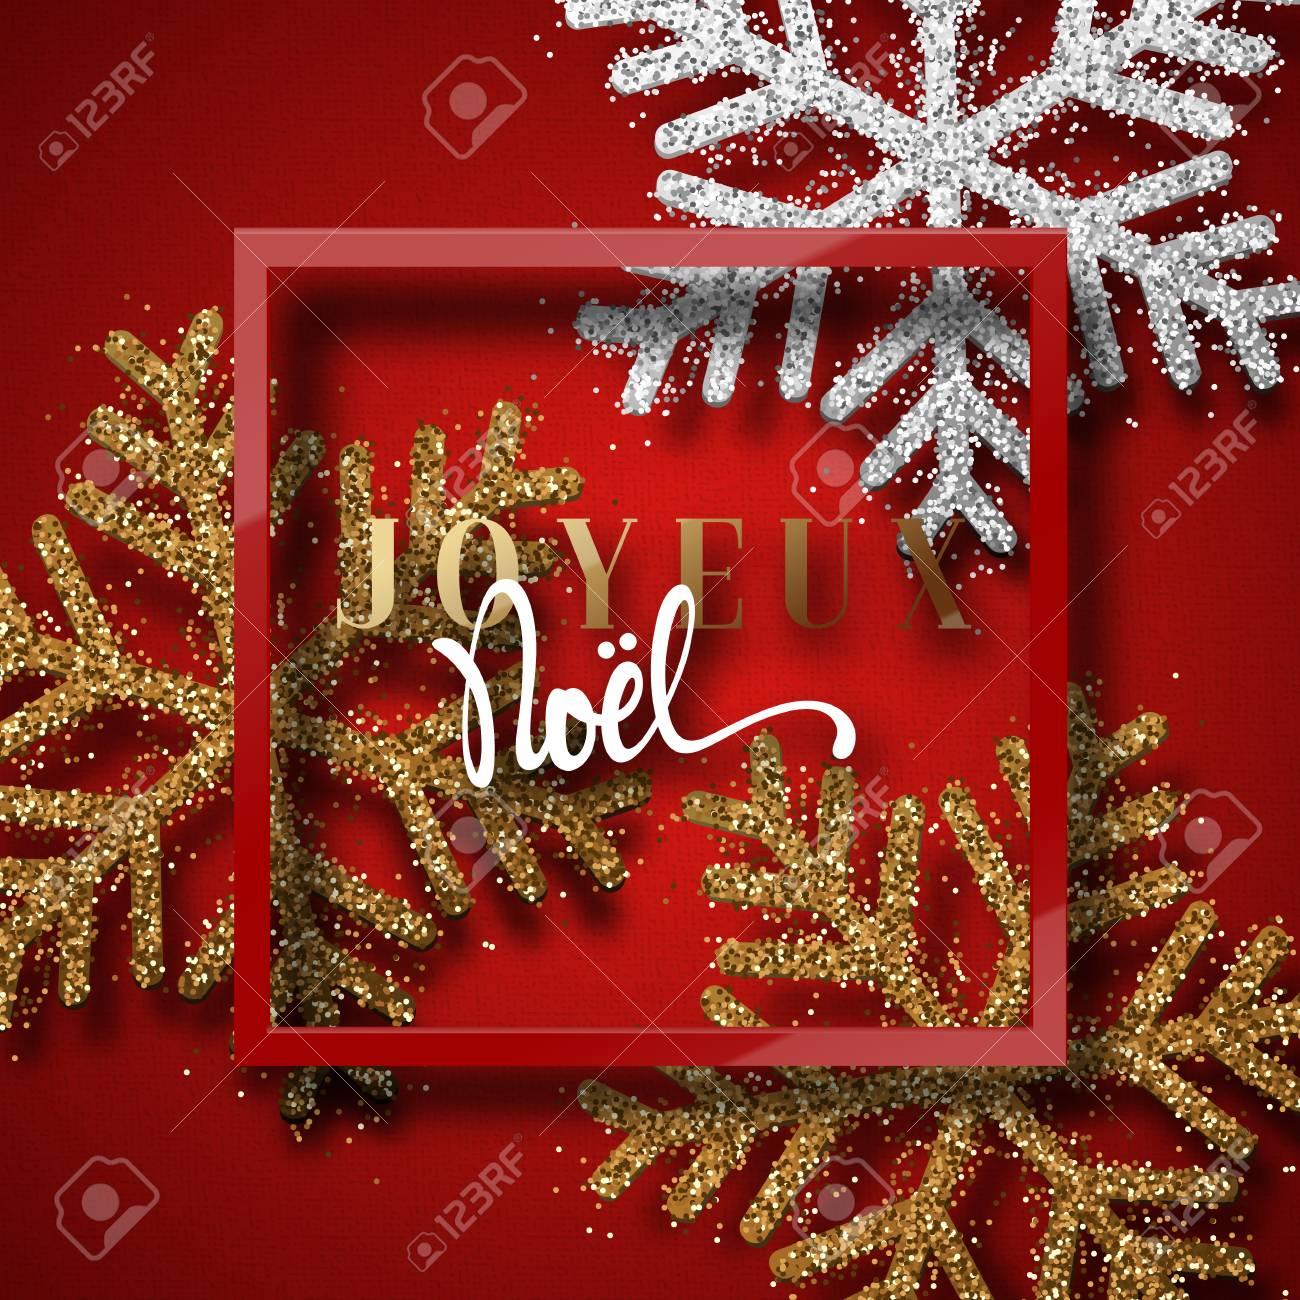 Merry Christmas. French Inscription. Joyeux Noel. Christmas ...